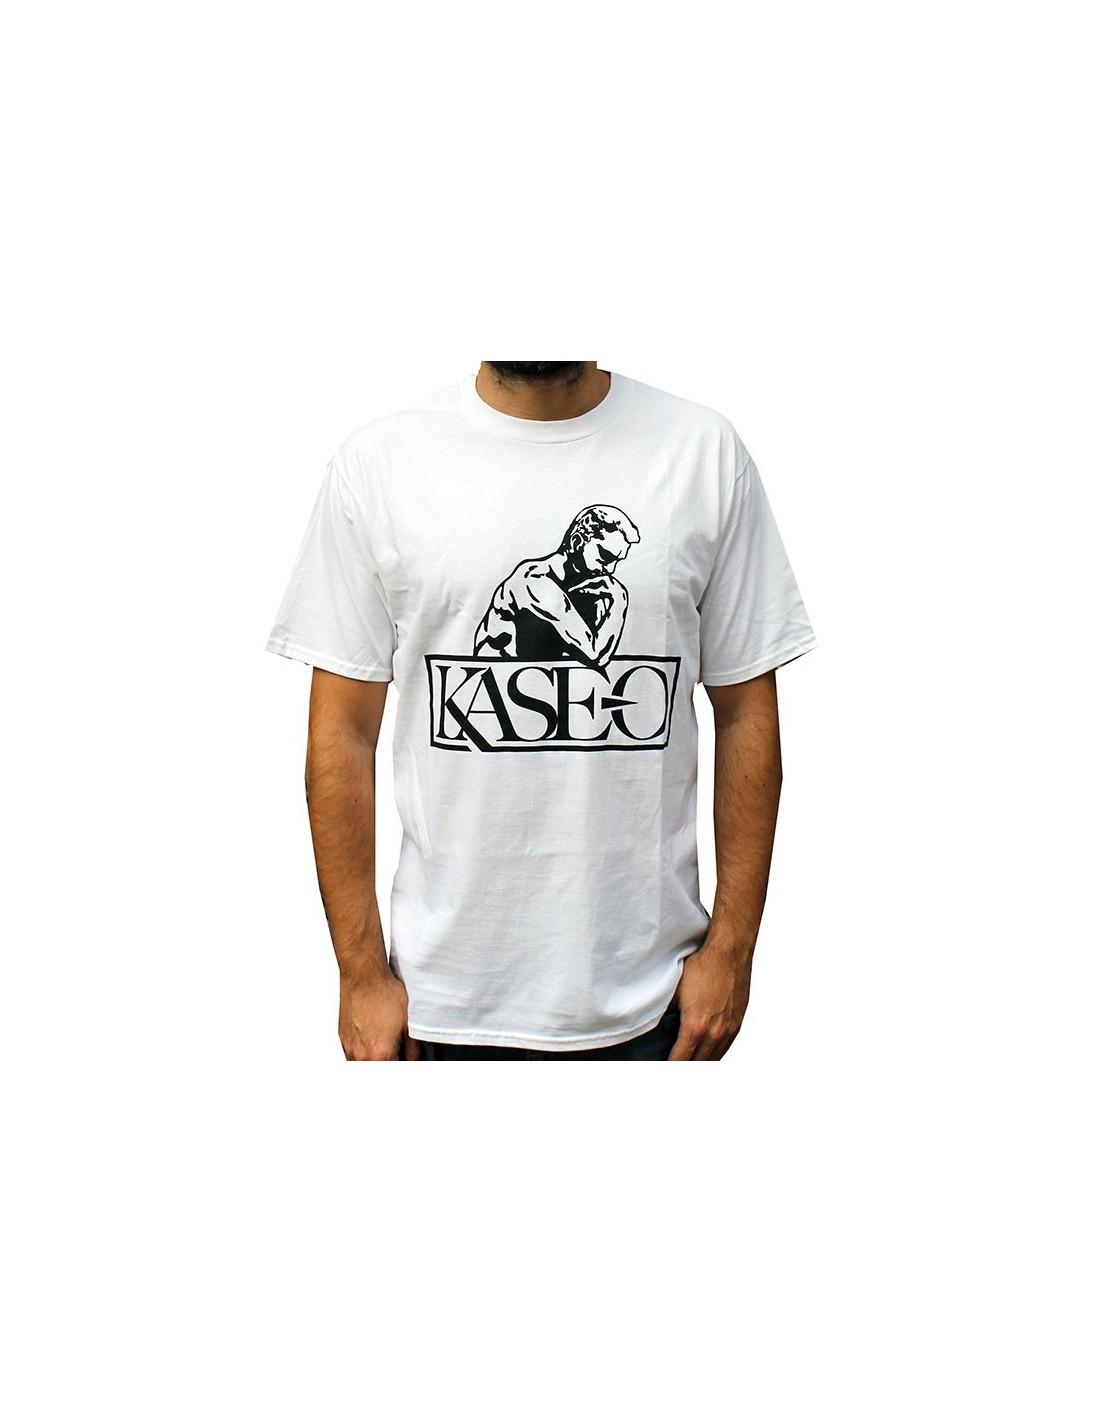 Camiseta hombres camiseta moda 2017 mens Camiseta de manga